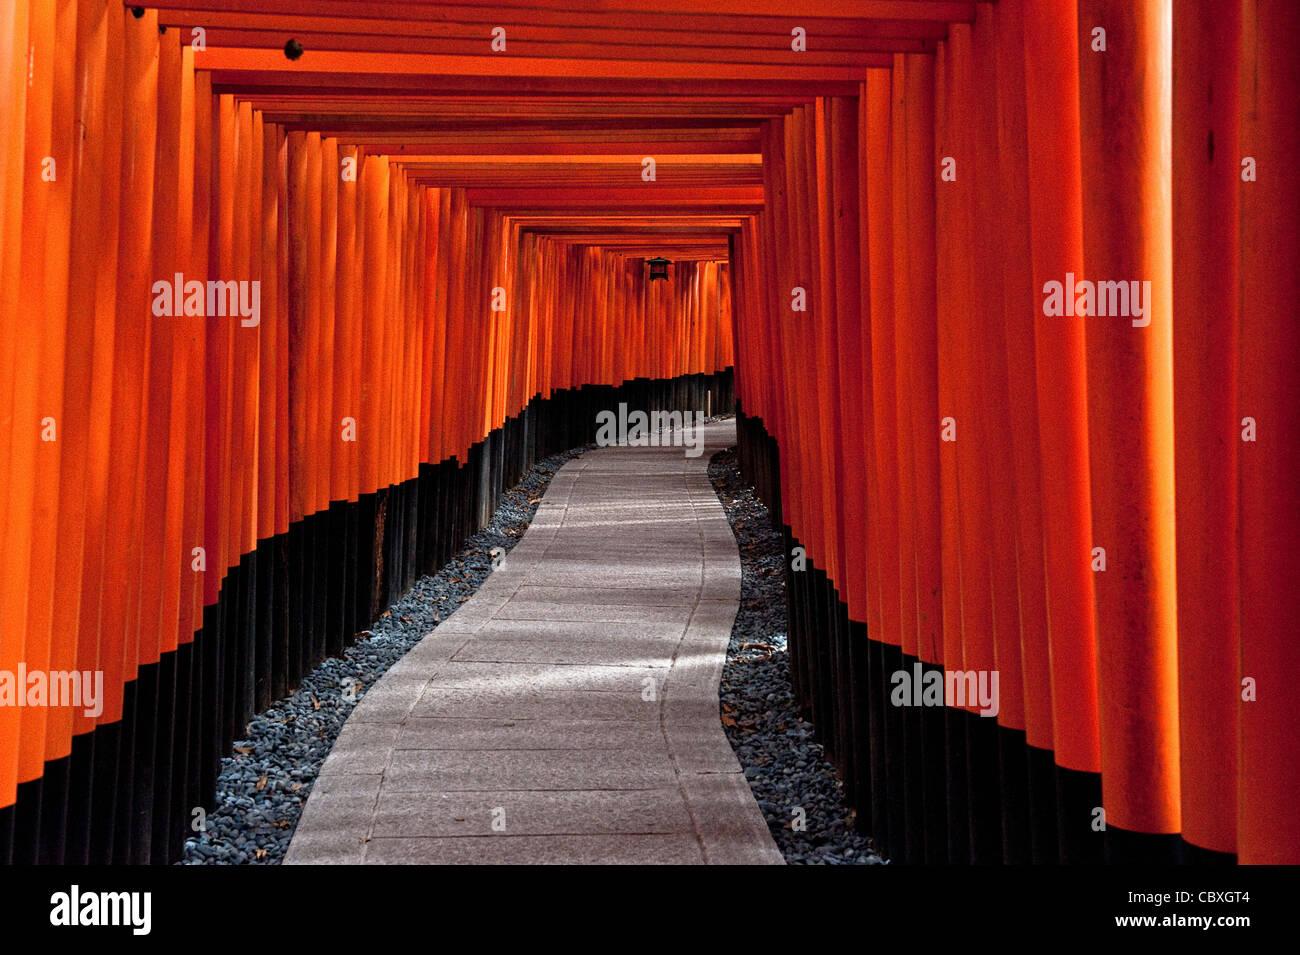 Fushimi Inari Shrine in Kyoto, Japon, religion Shinto, Japon Photo Stock